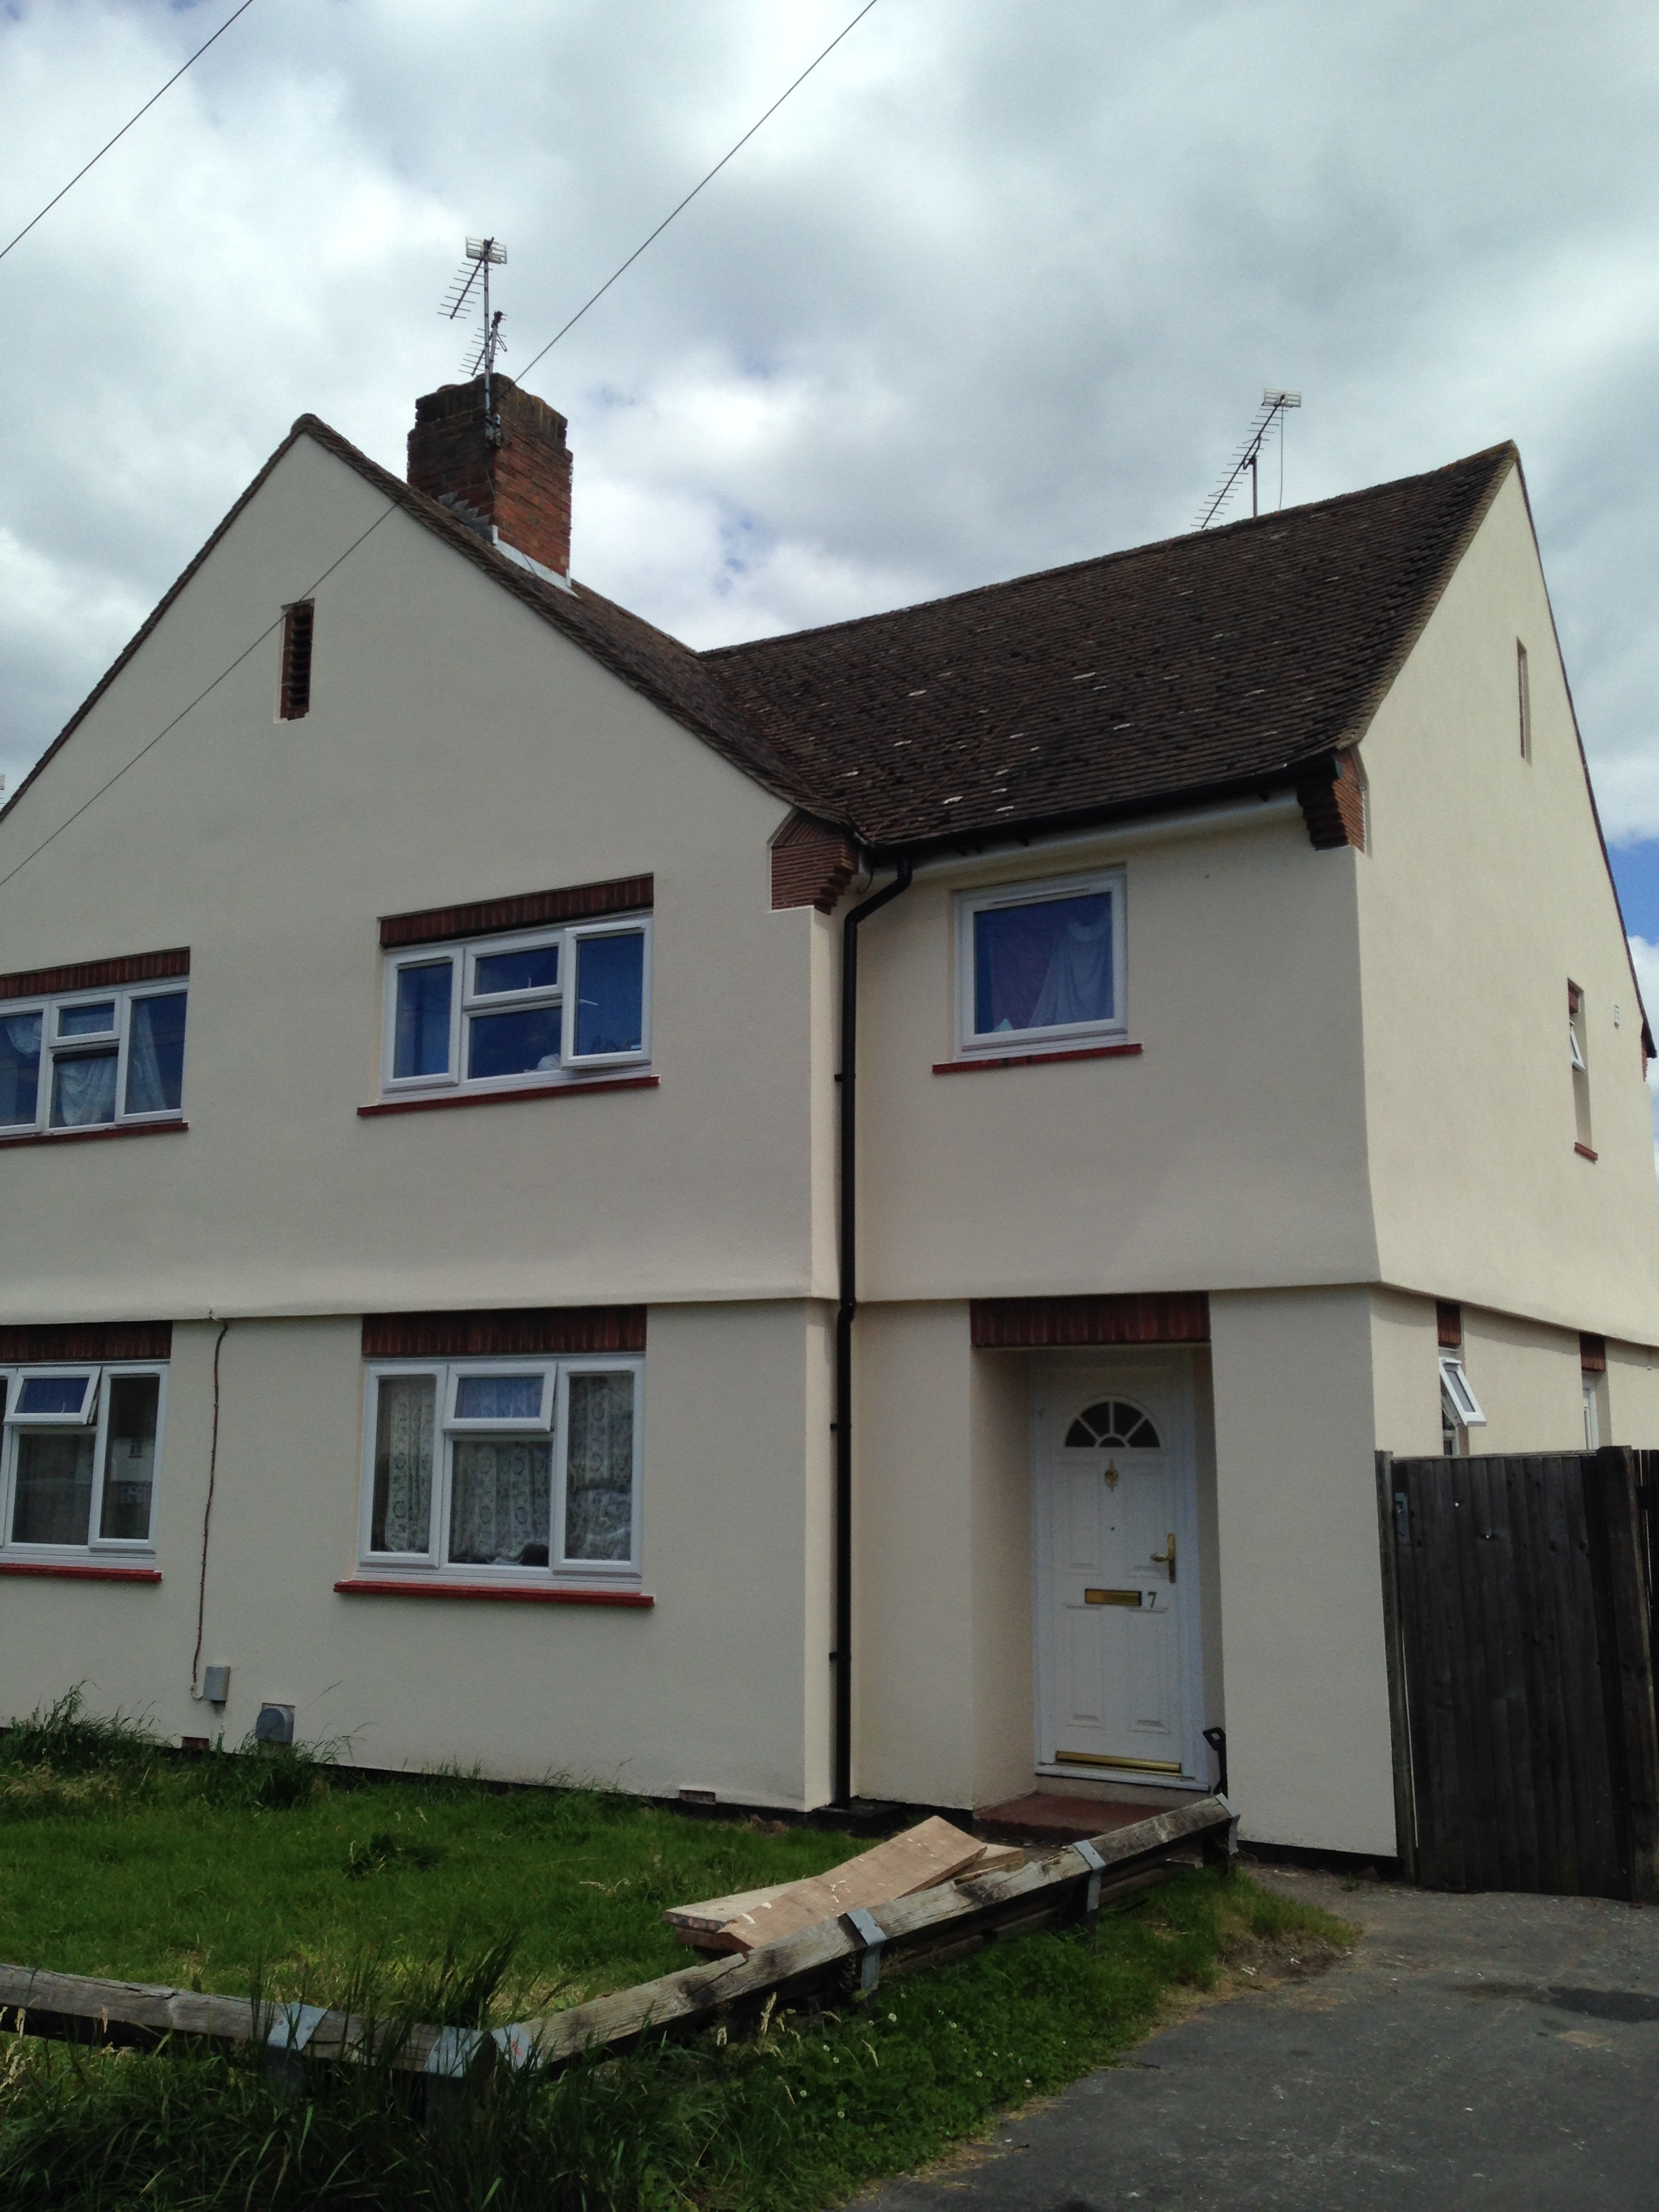 New Vision Homes Woking Housing Association